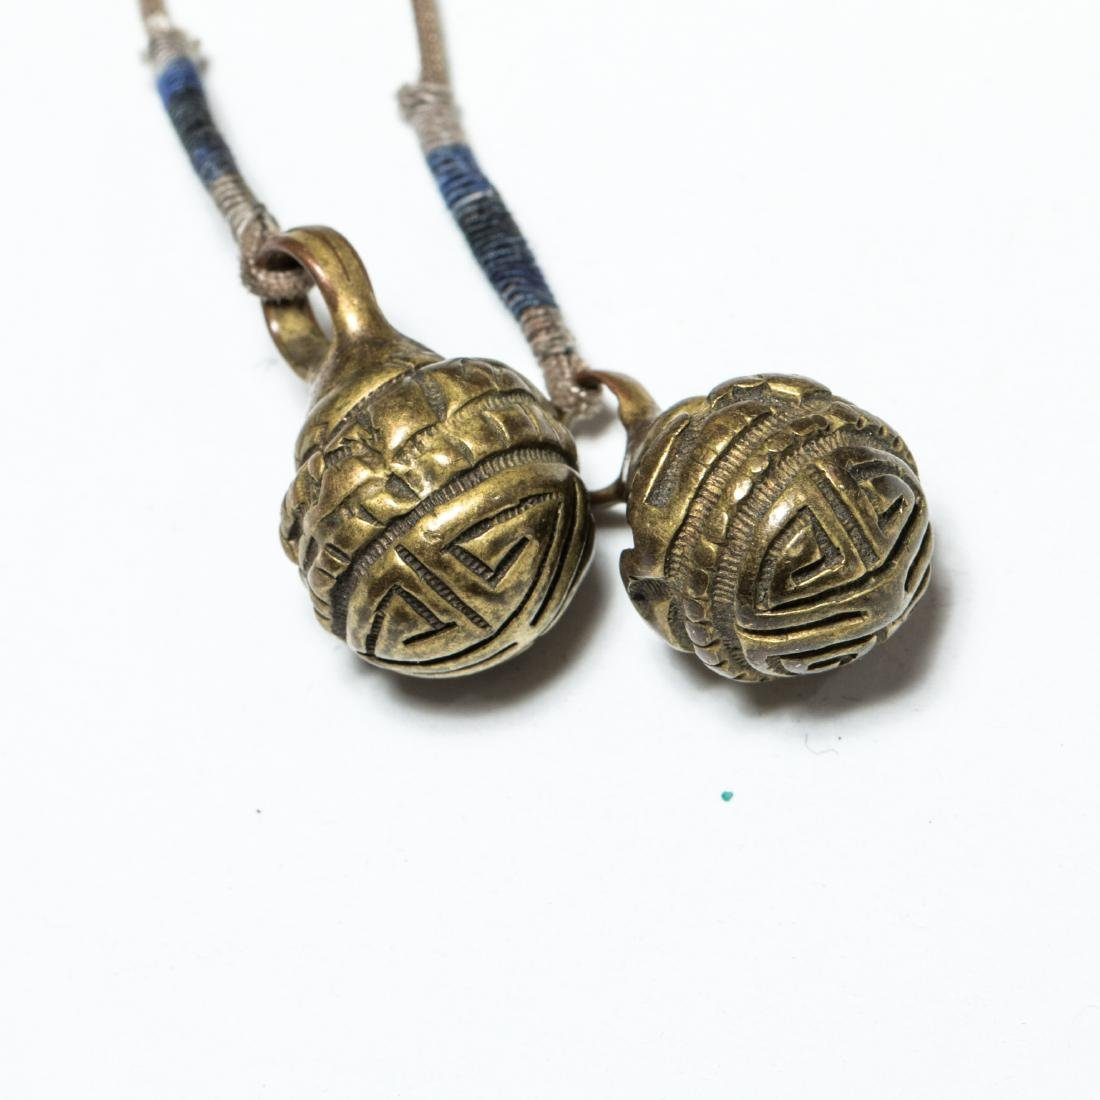 19th Antique Ruby Prayer Beads - 2